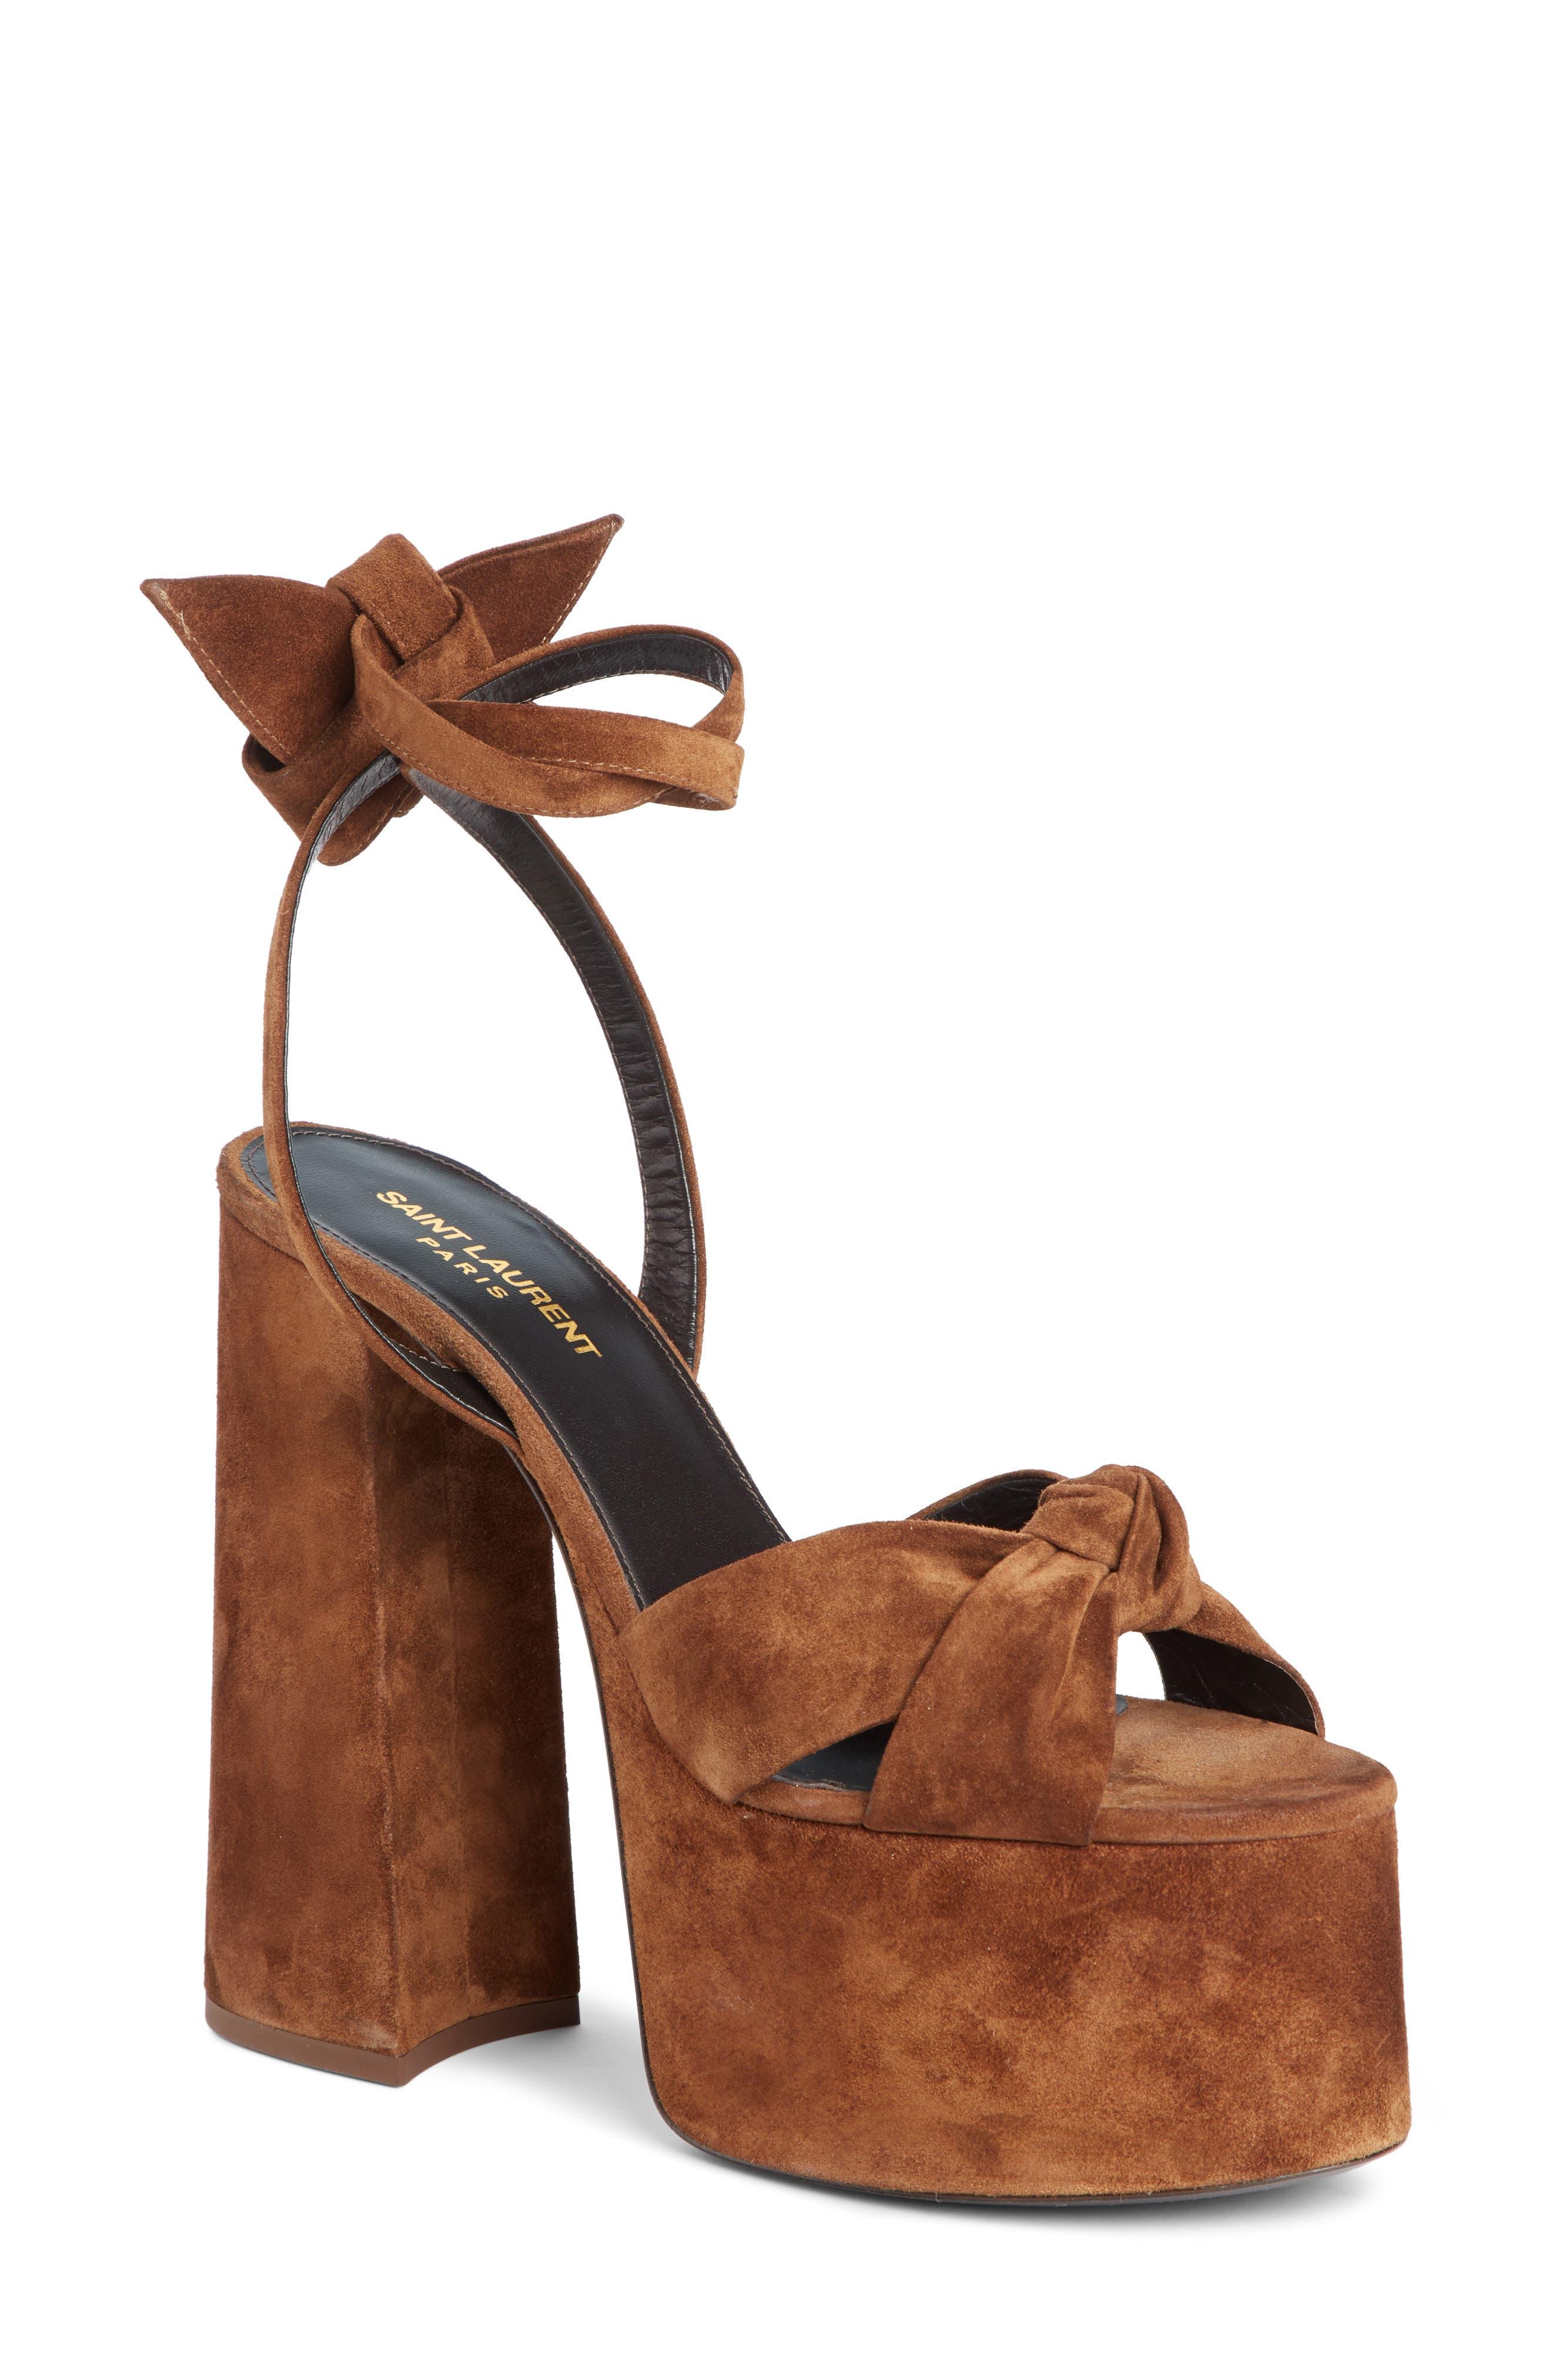 Paige Platform Suede Sandals in Brown Suede